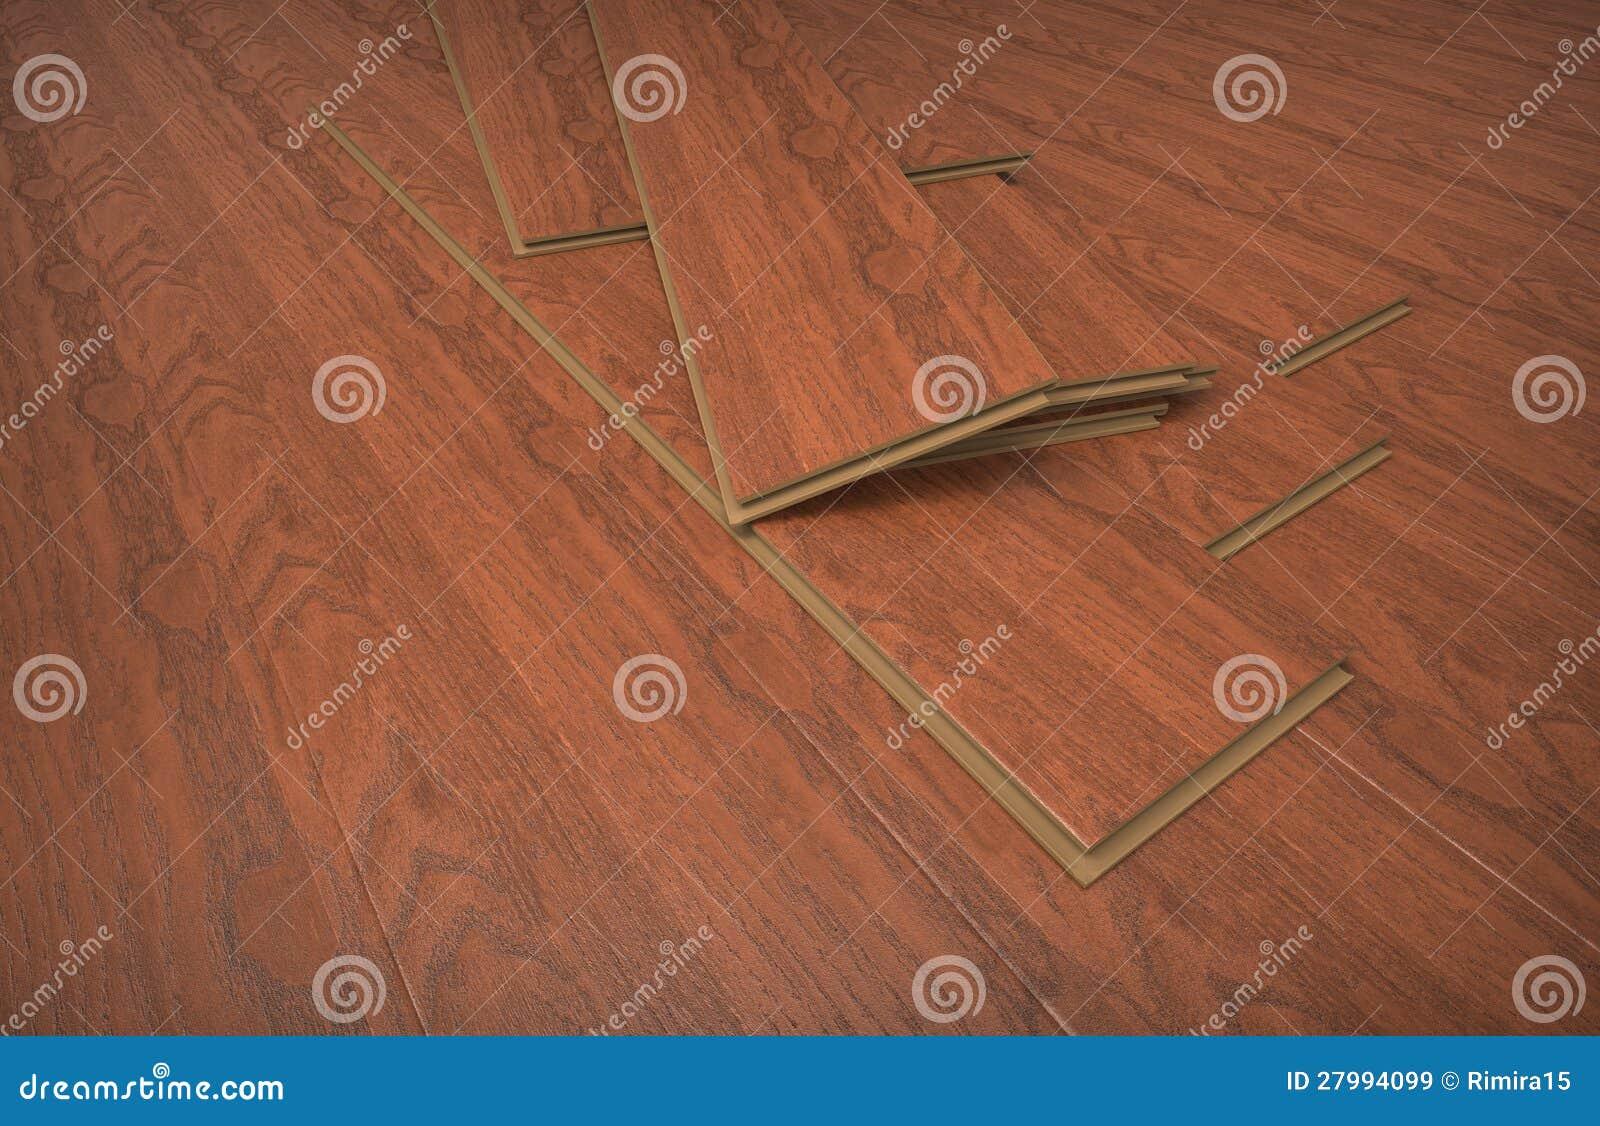 laminate flooring royalty free stock images image 27994099